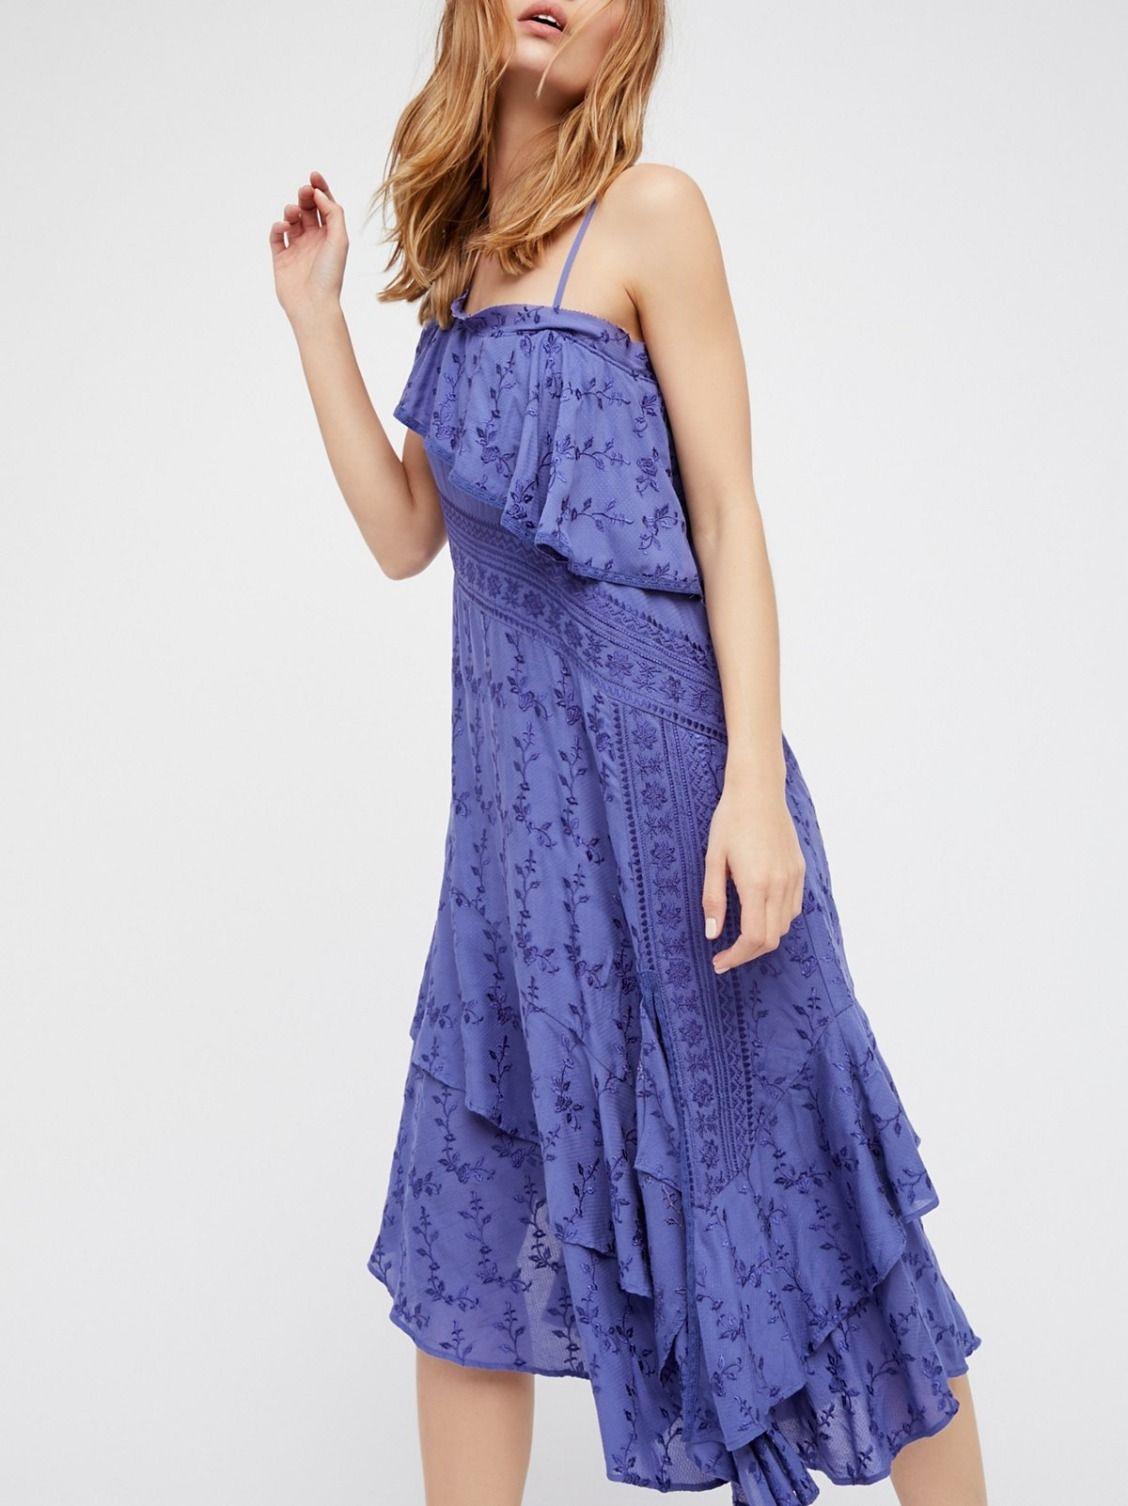 Eastern Sun Midi Dress | New Arrivals | Pinterest